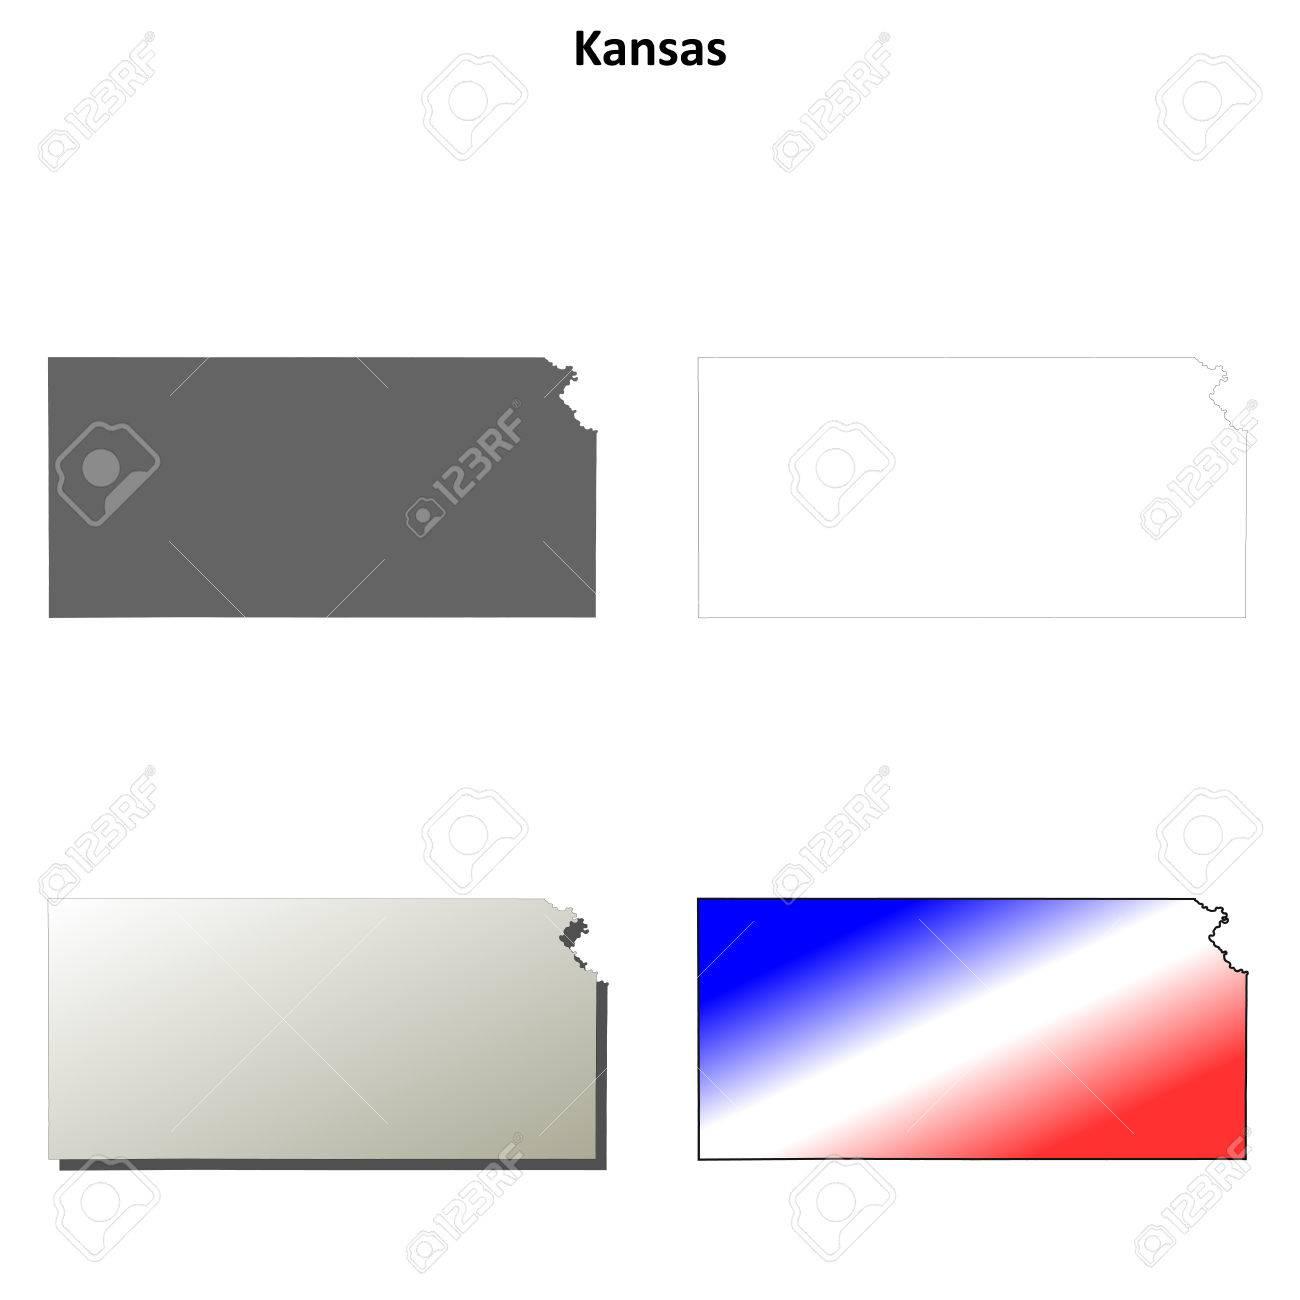 Kansas state blank vector outline map set on kansas major cities map blank, ny state map blank, florida state map blank, kansas weather map blank, hawaii state map blank, washington state map blank, alaska state map blank,